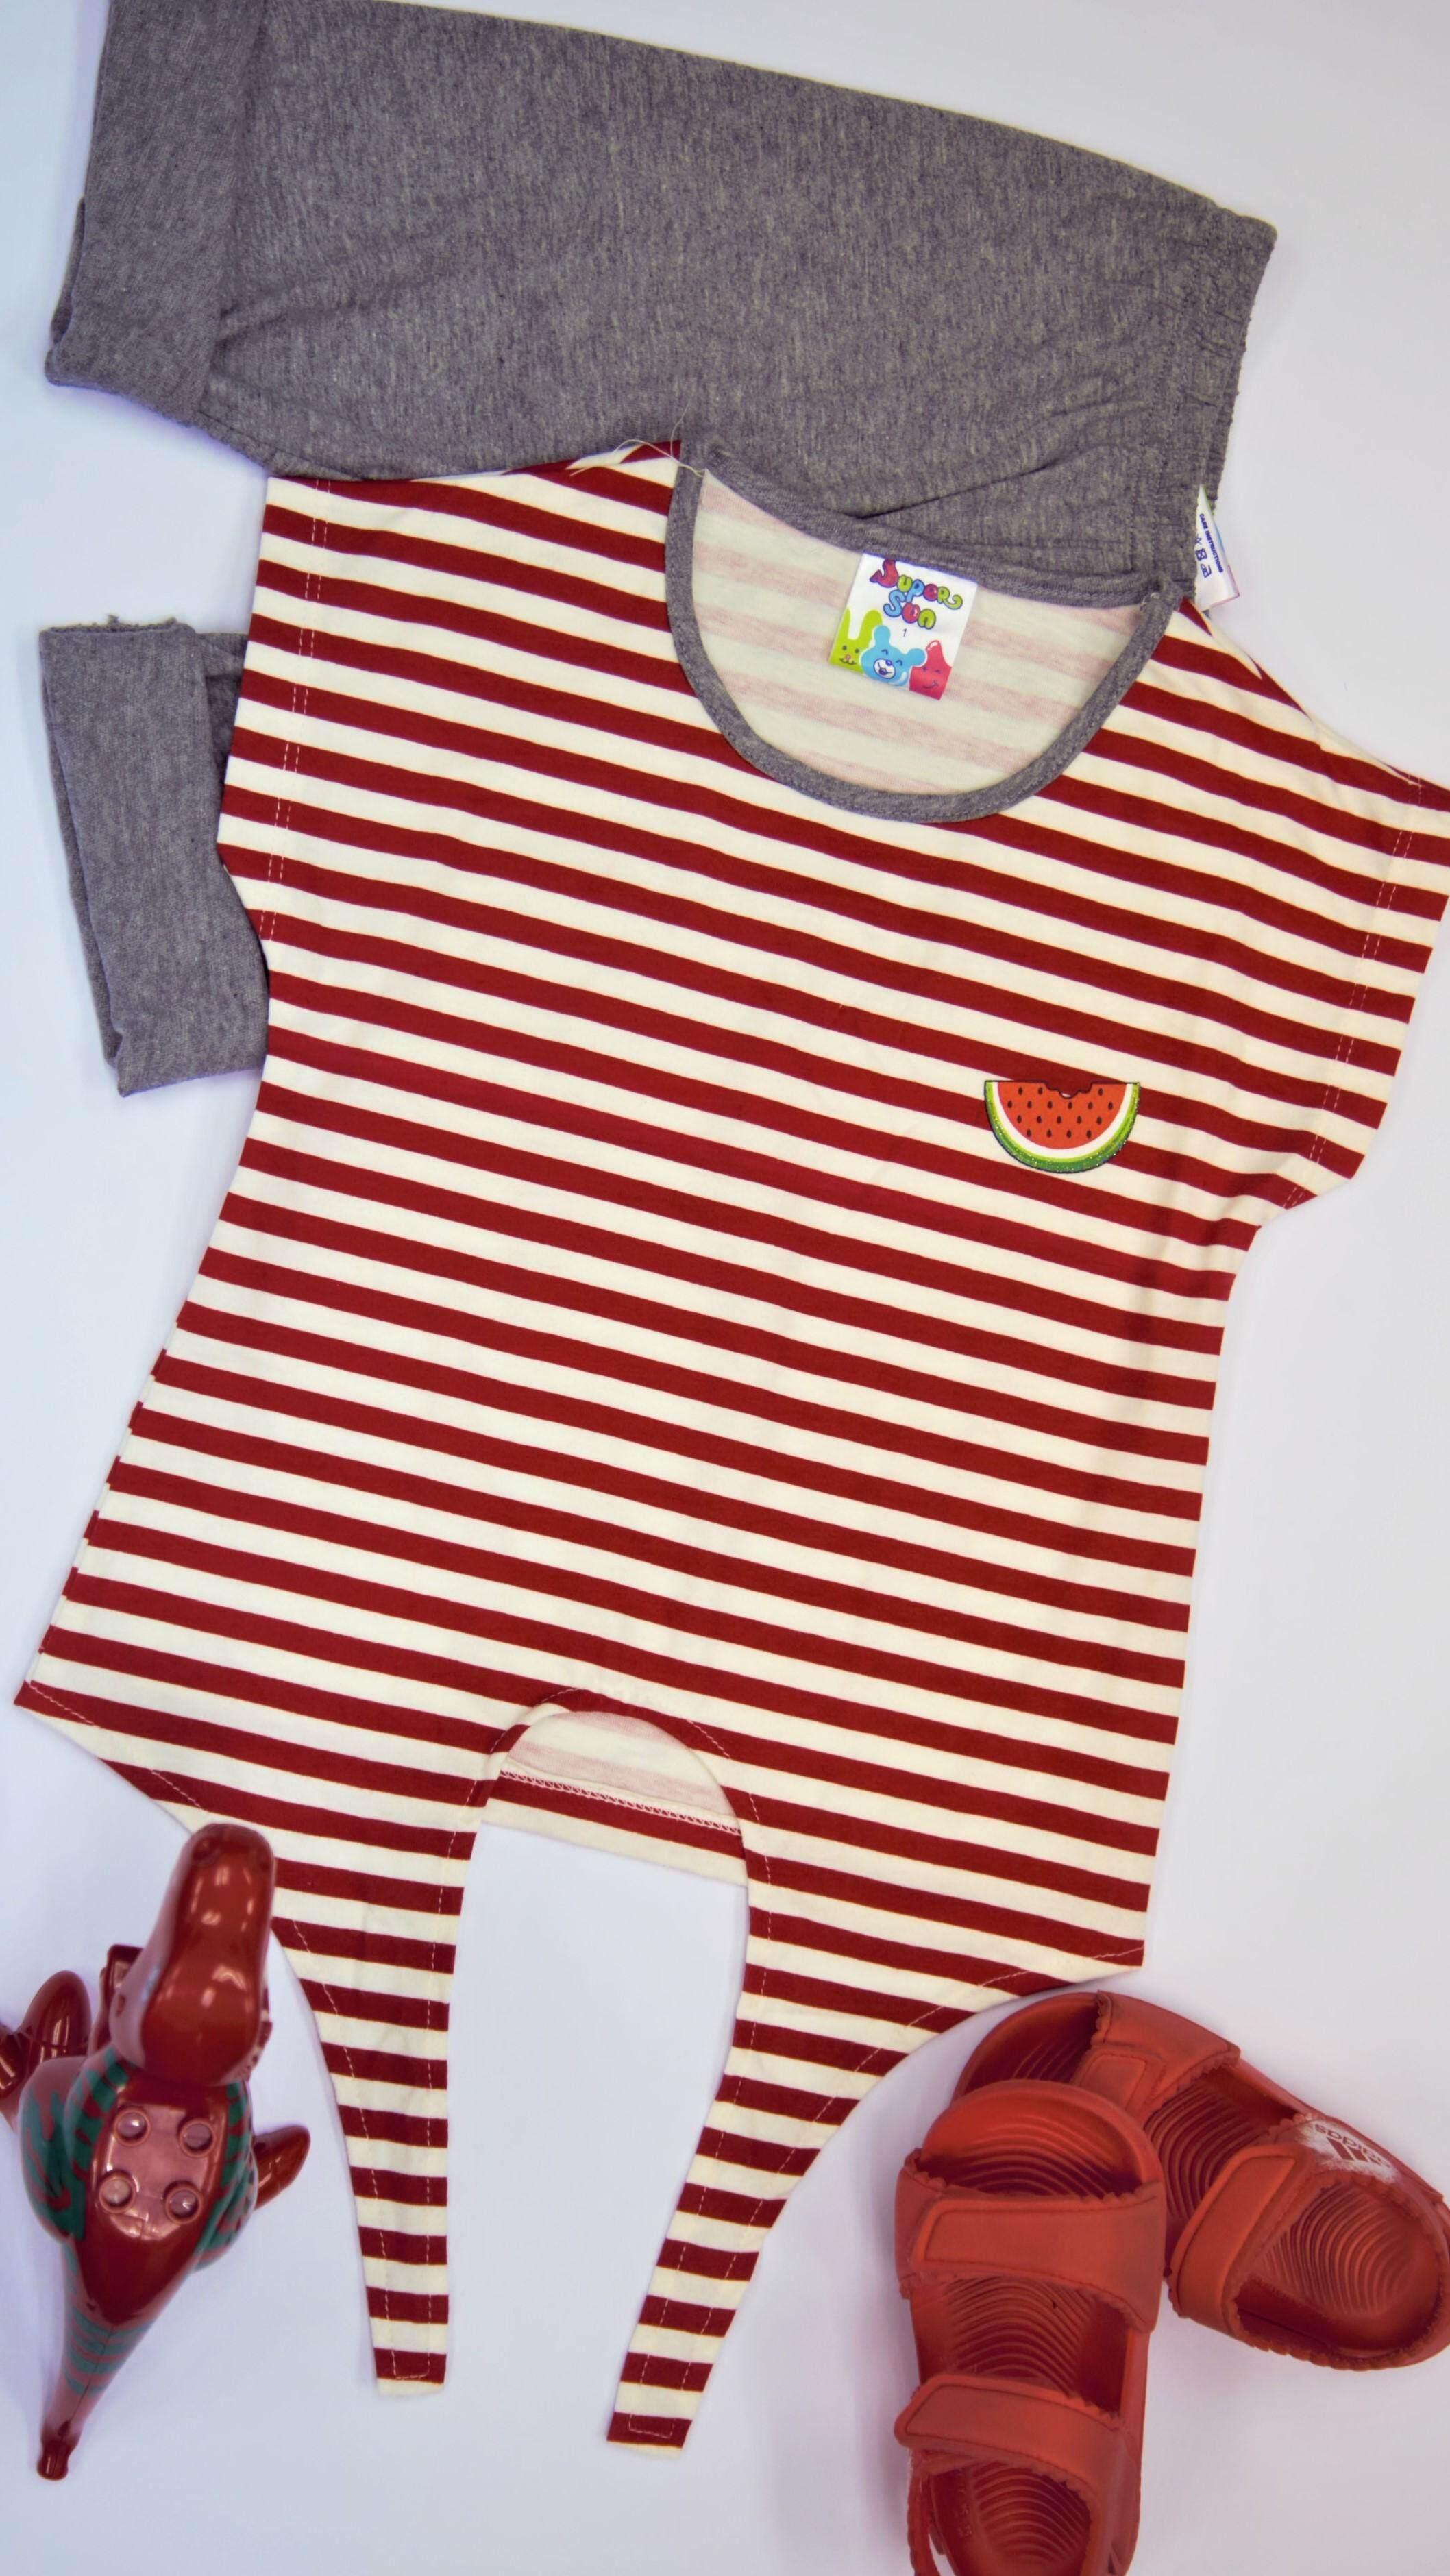 Super Sun Toddler Girl Short Sleeve Set(Top + Bottom) GS-01C Red